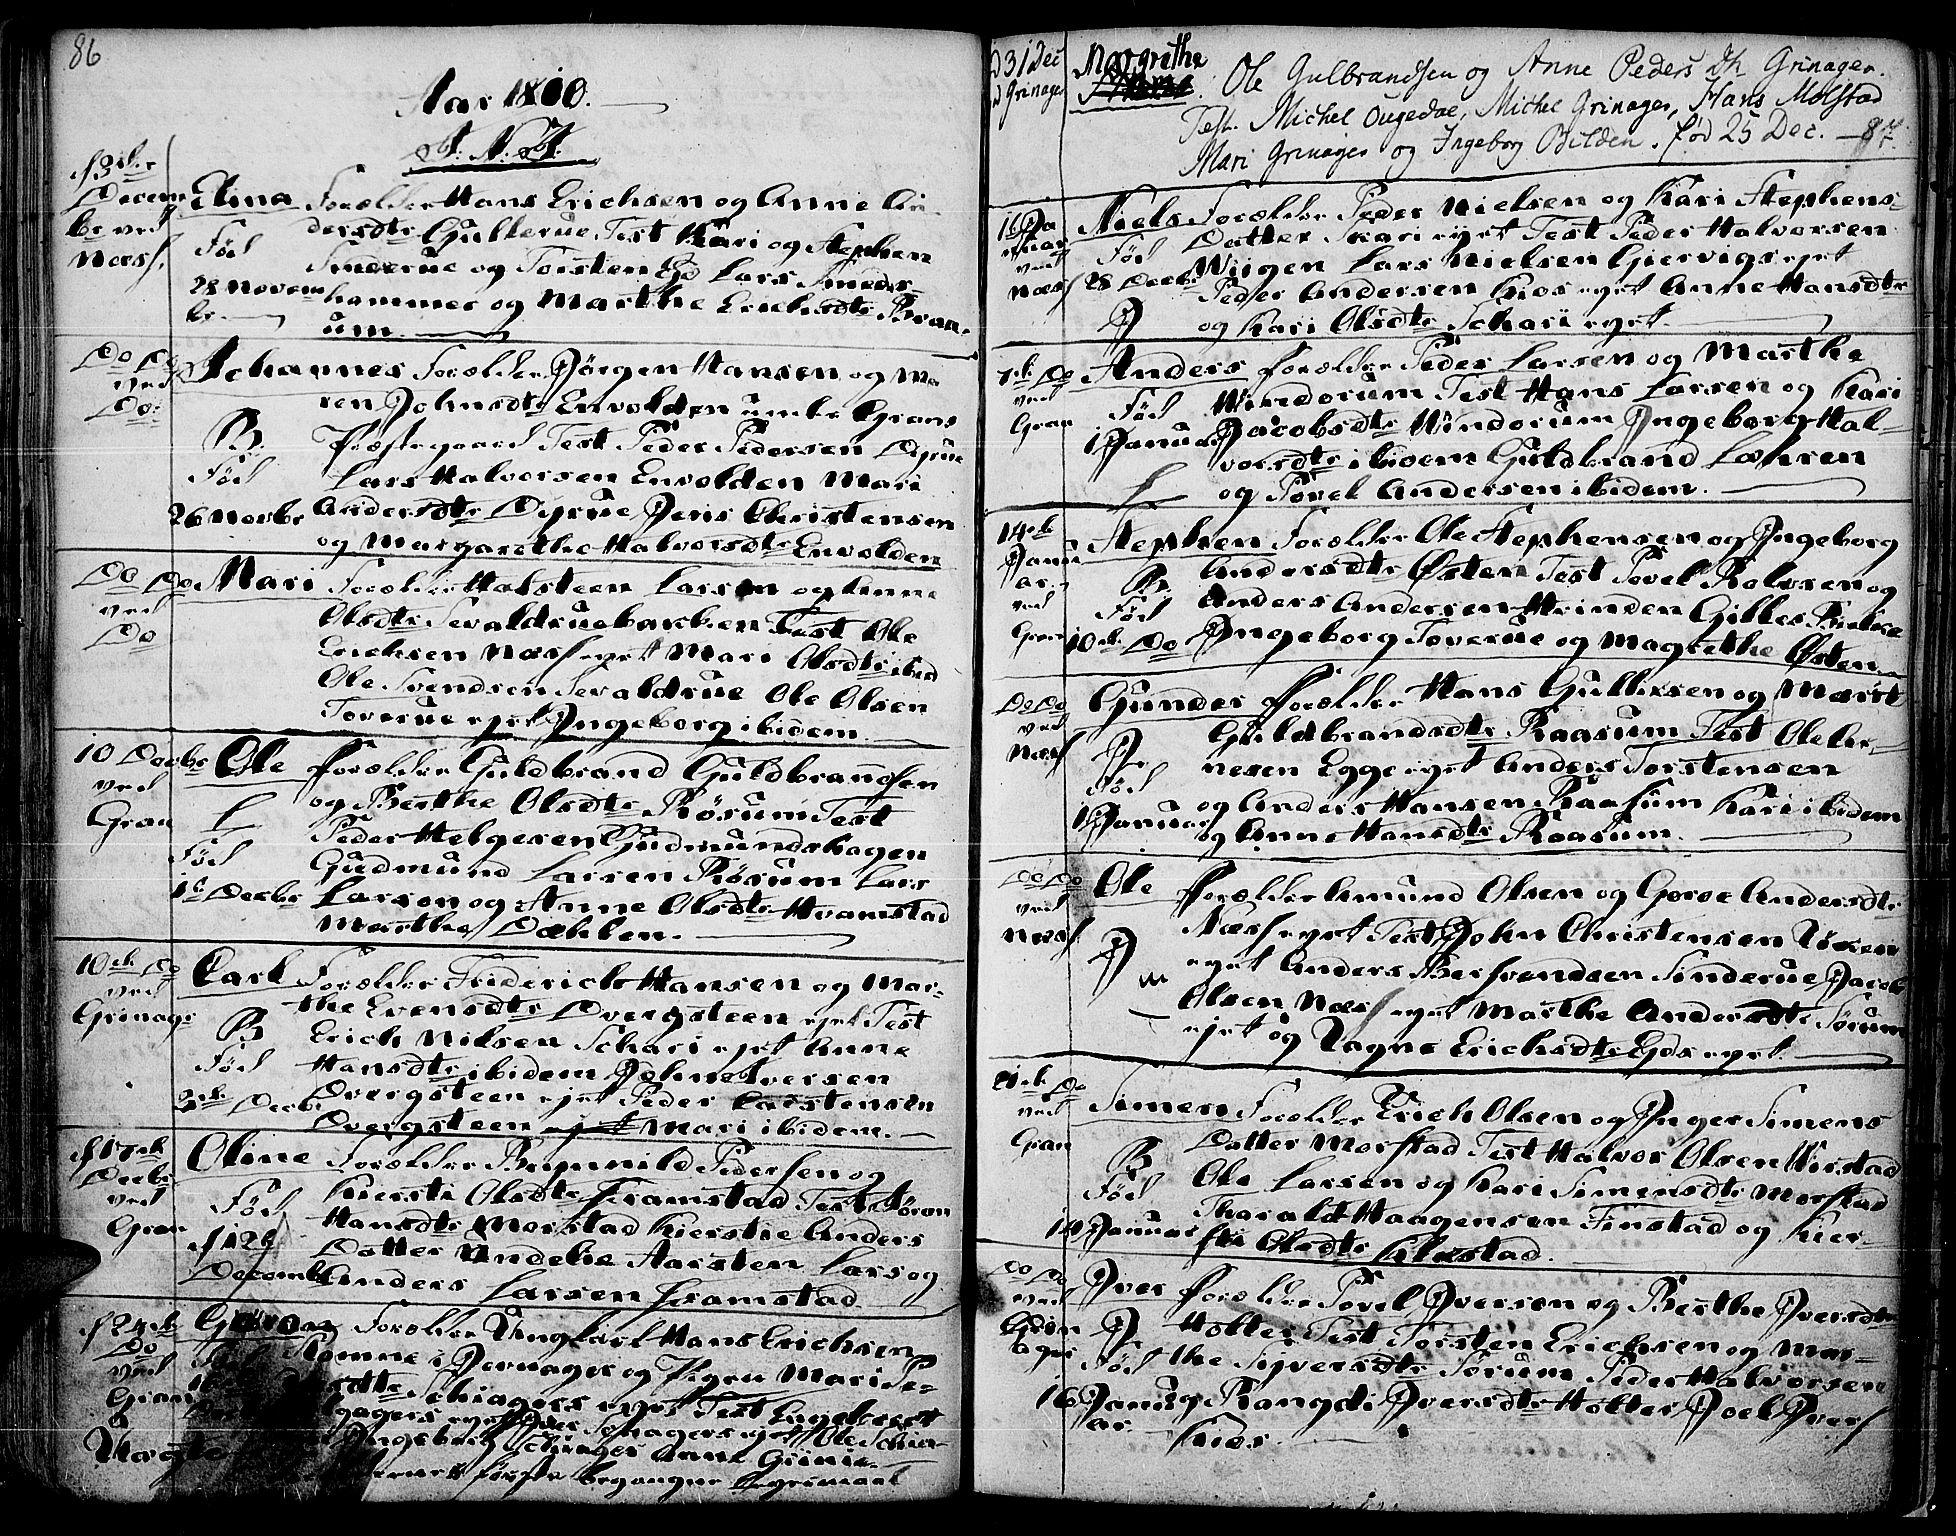 SAH, Gran prestekontor, Ministerialbok nr. 7, 1804-1815, s. 86-87